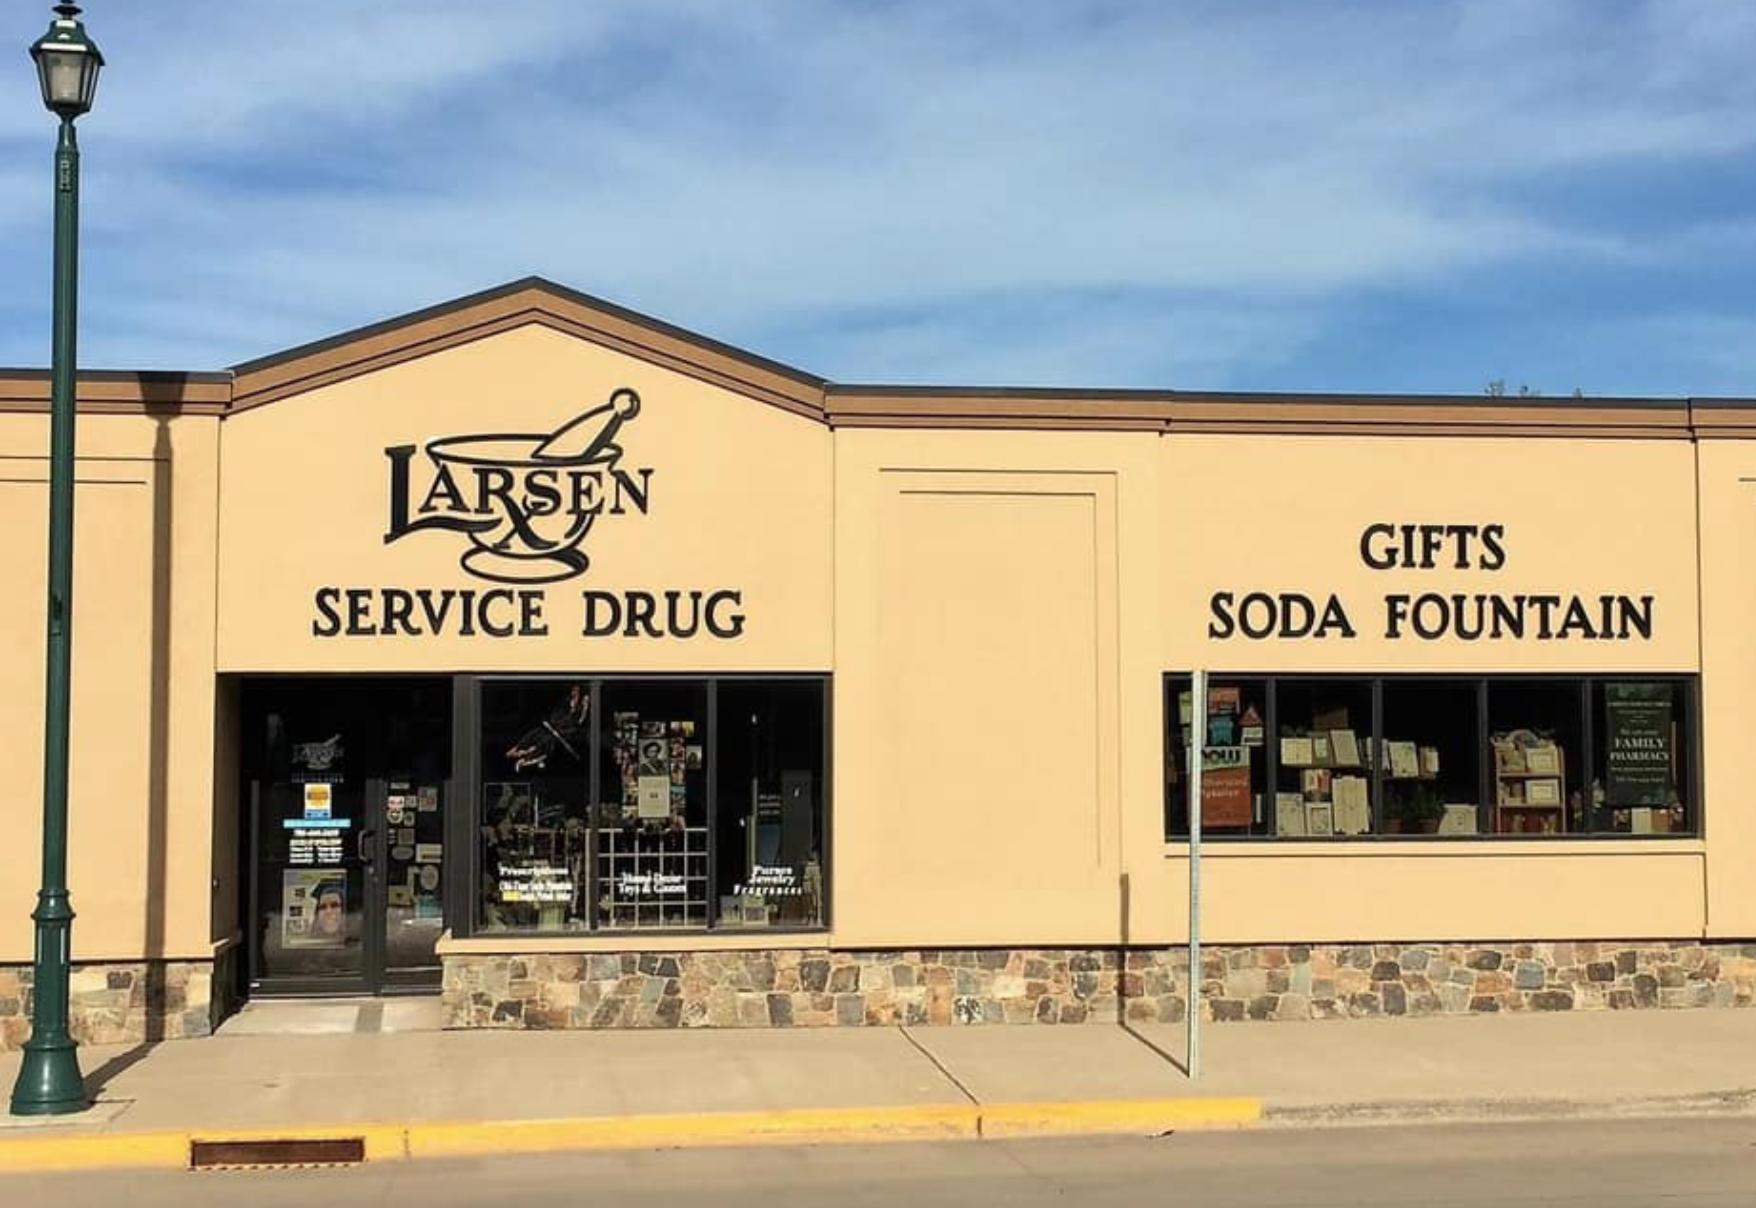 Larsen Service Drug Soda Fountain Has The Best Nostalgia-Filled Ice Cream In North Dakota